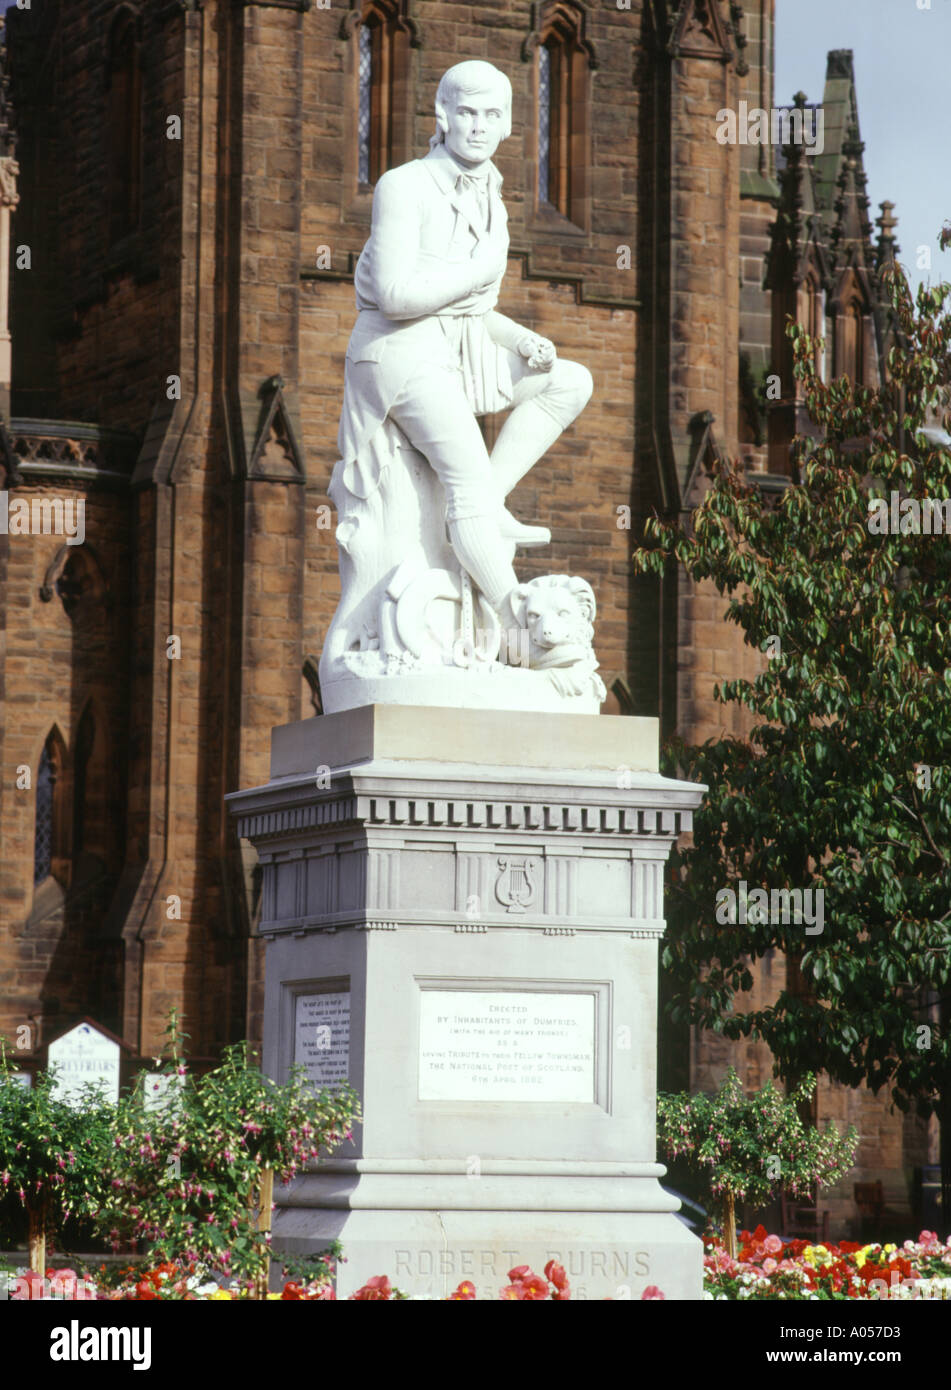 dh Robert Burns DUMFRIES GALLOWAY Robbie Statue poet bard historical scottish figures scotland Stock Photo